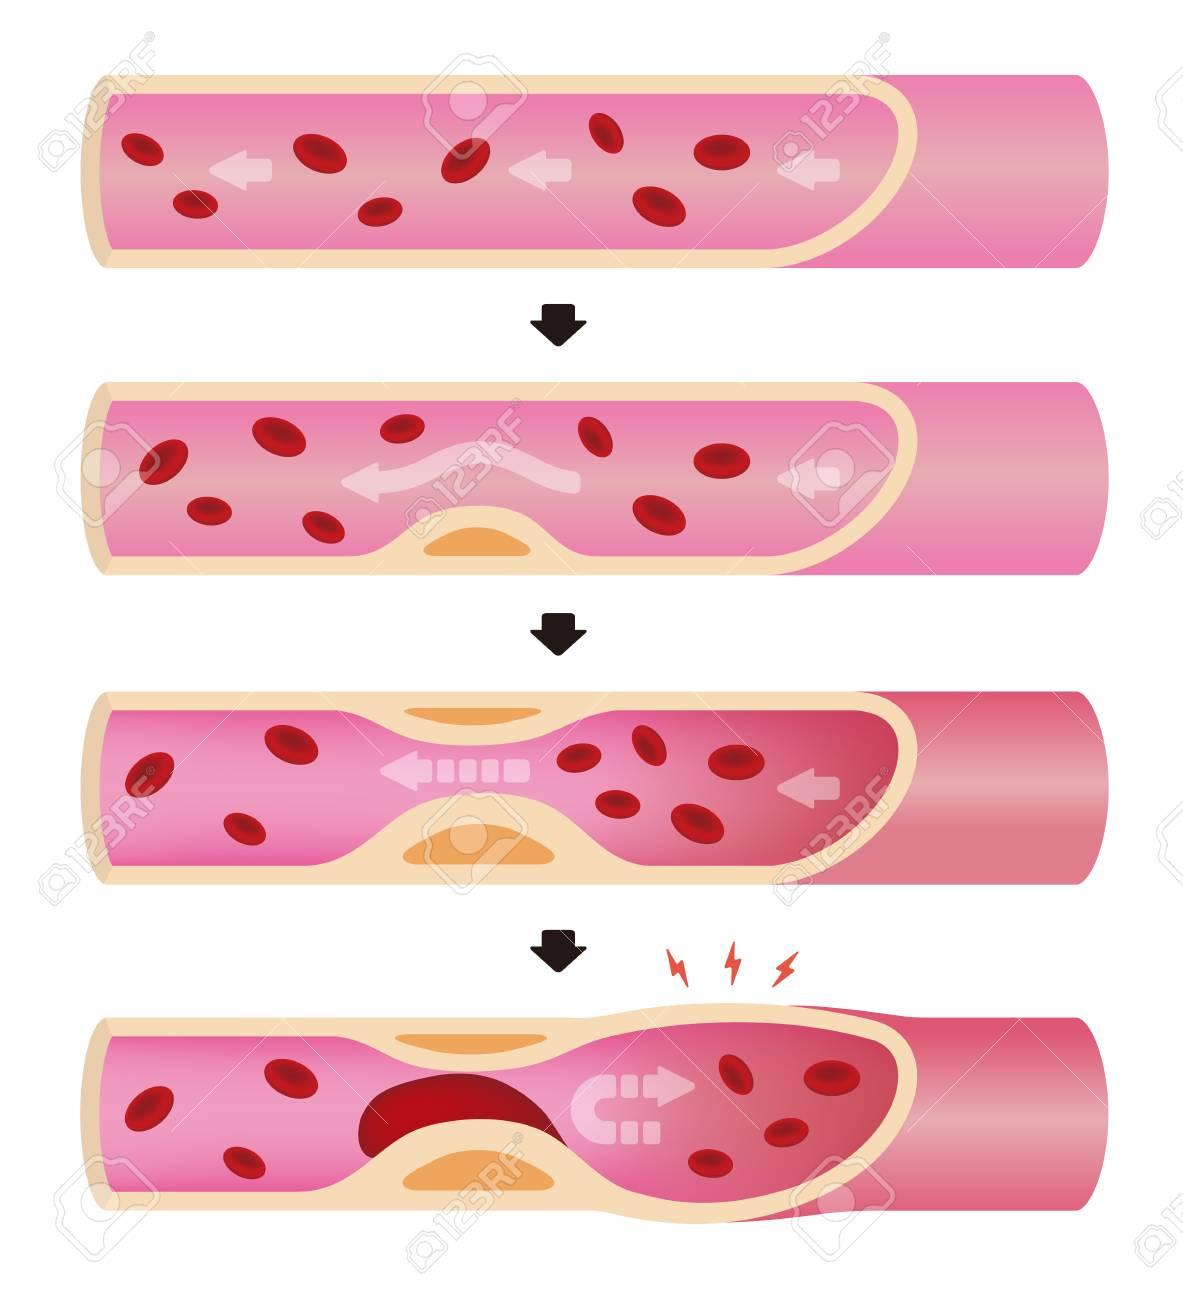 Progression of arteriosclerosis illustration (No text) - 93809705